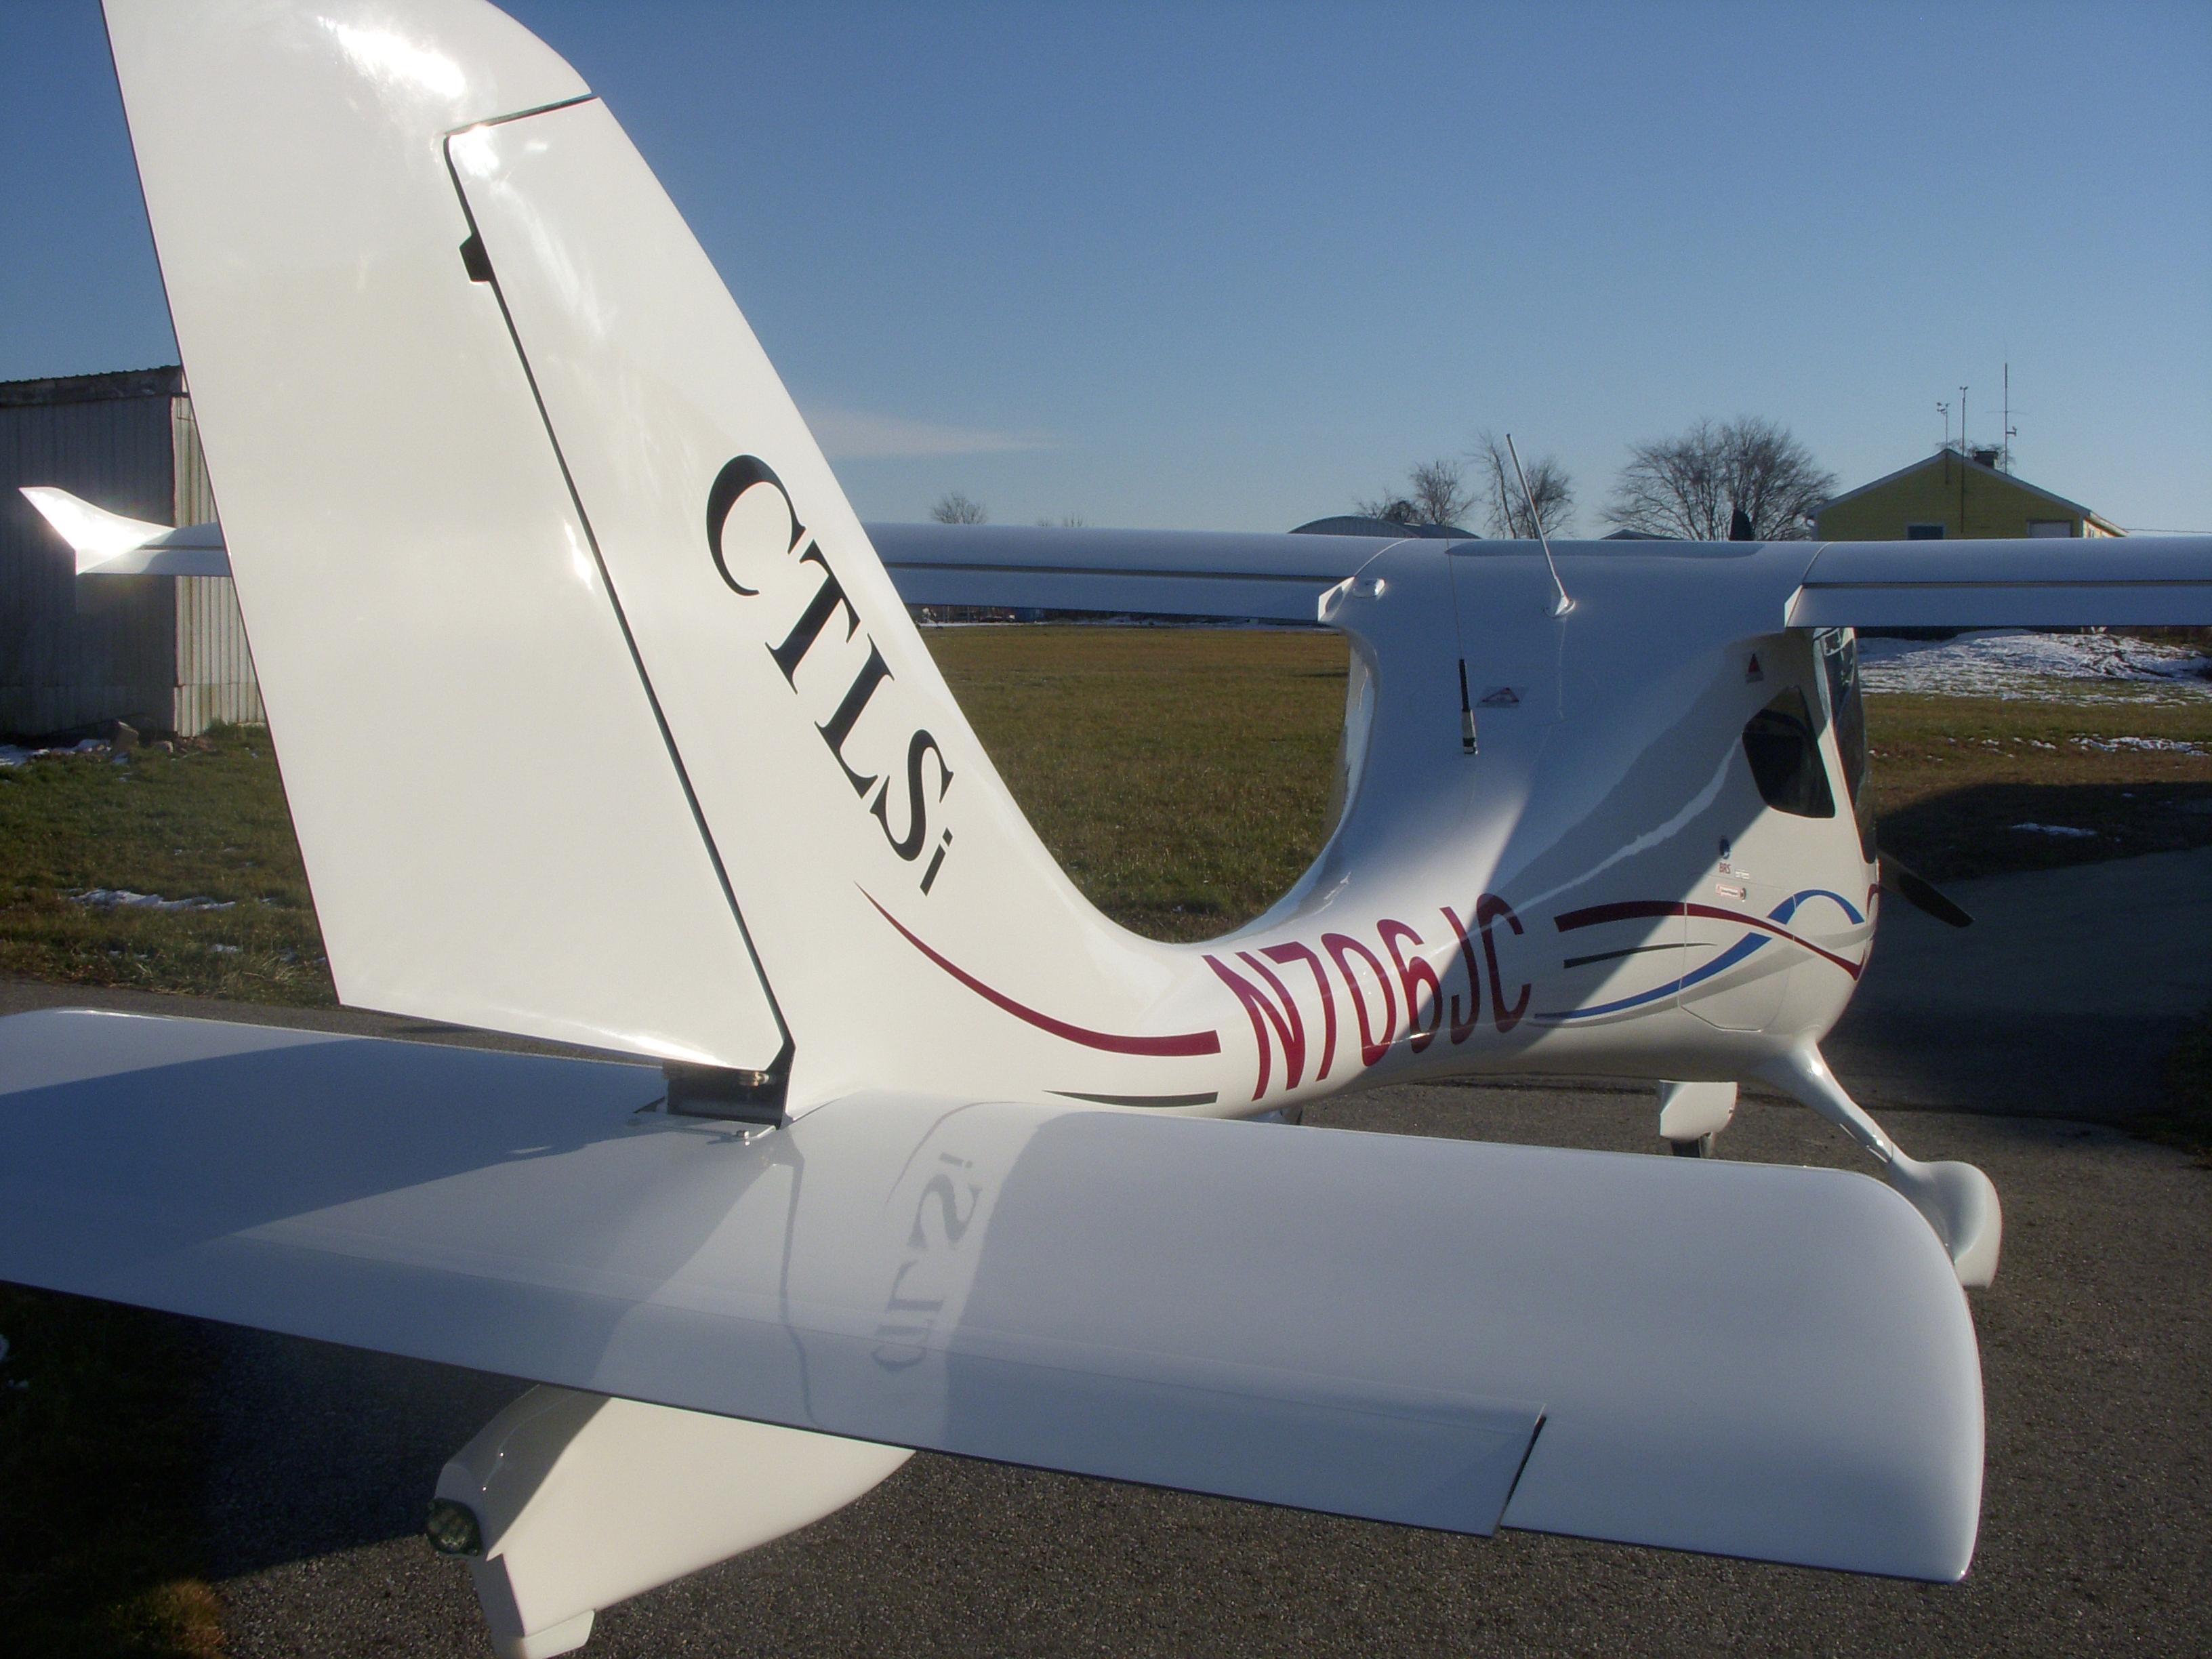 ctlsi-tail-view-1112